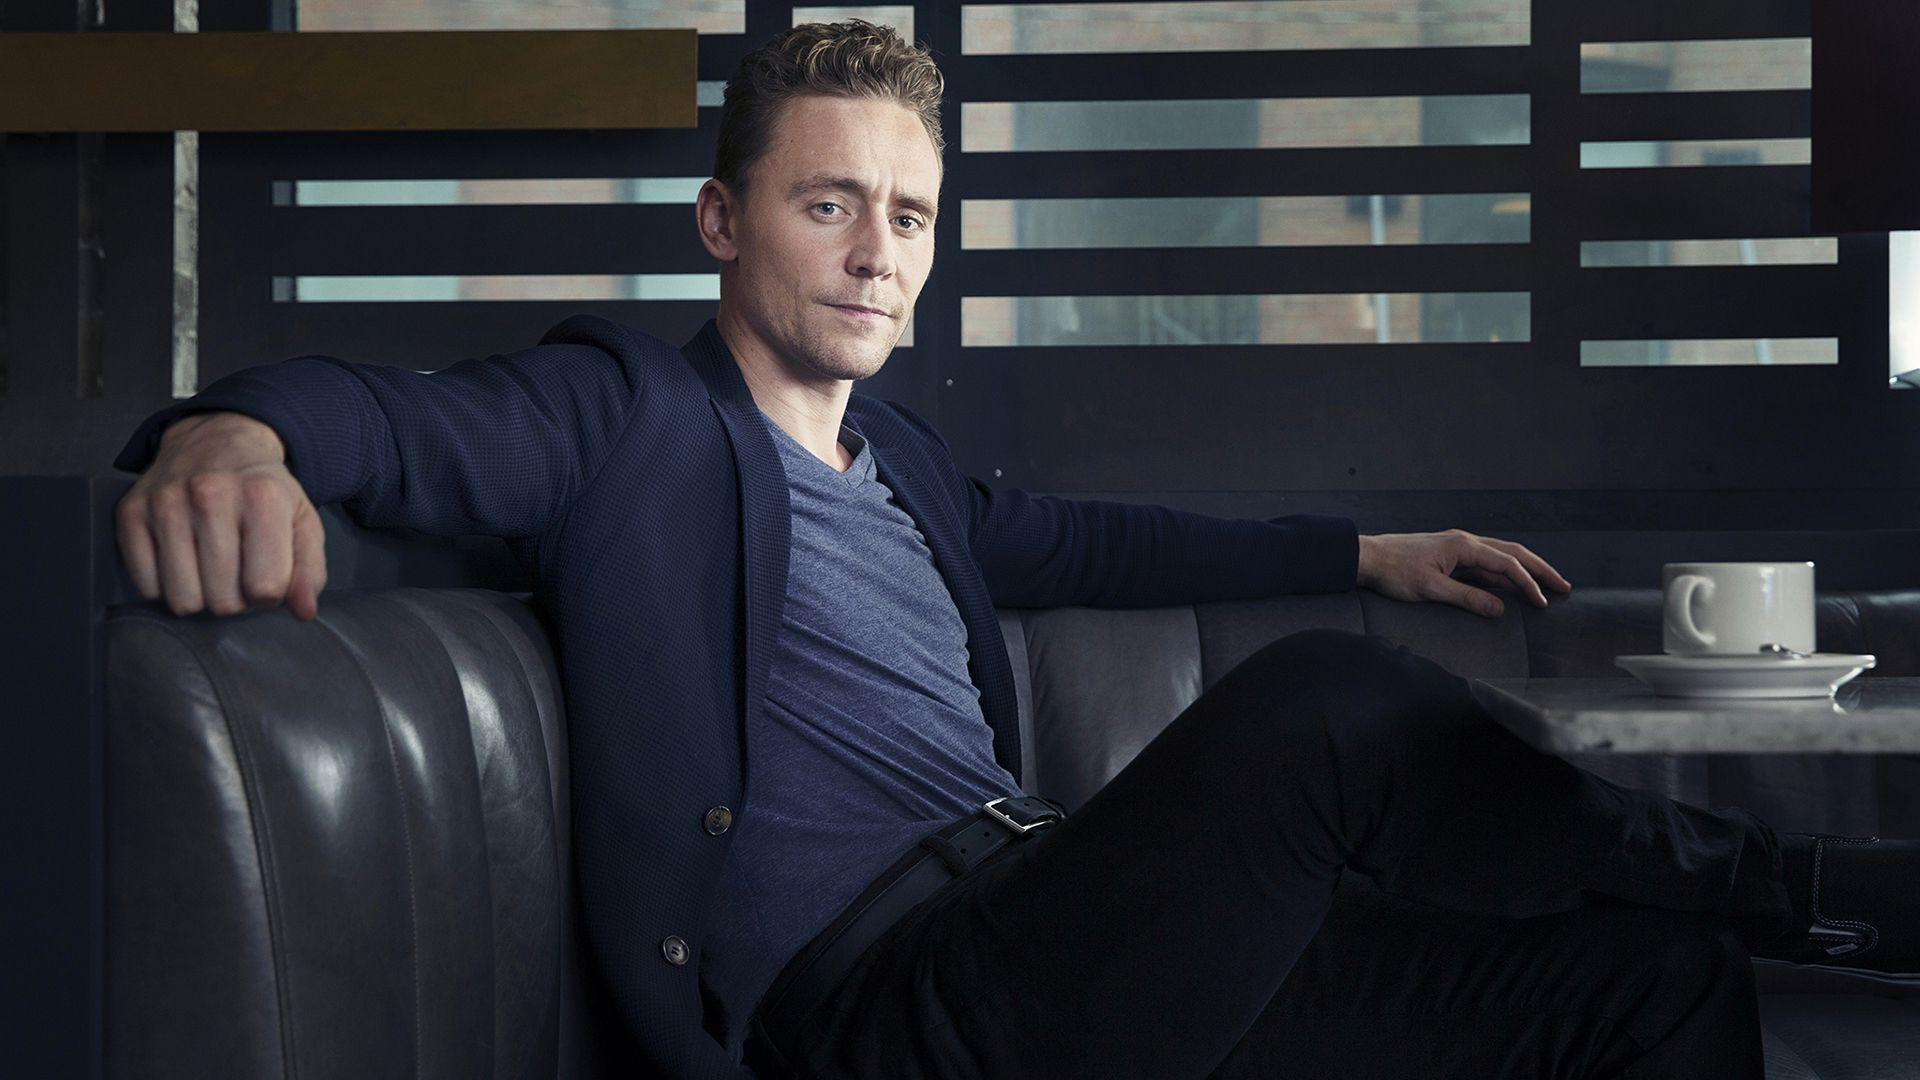 Tom Hiddleston 2018 Wallpapers